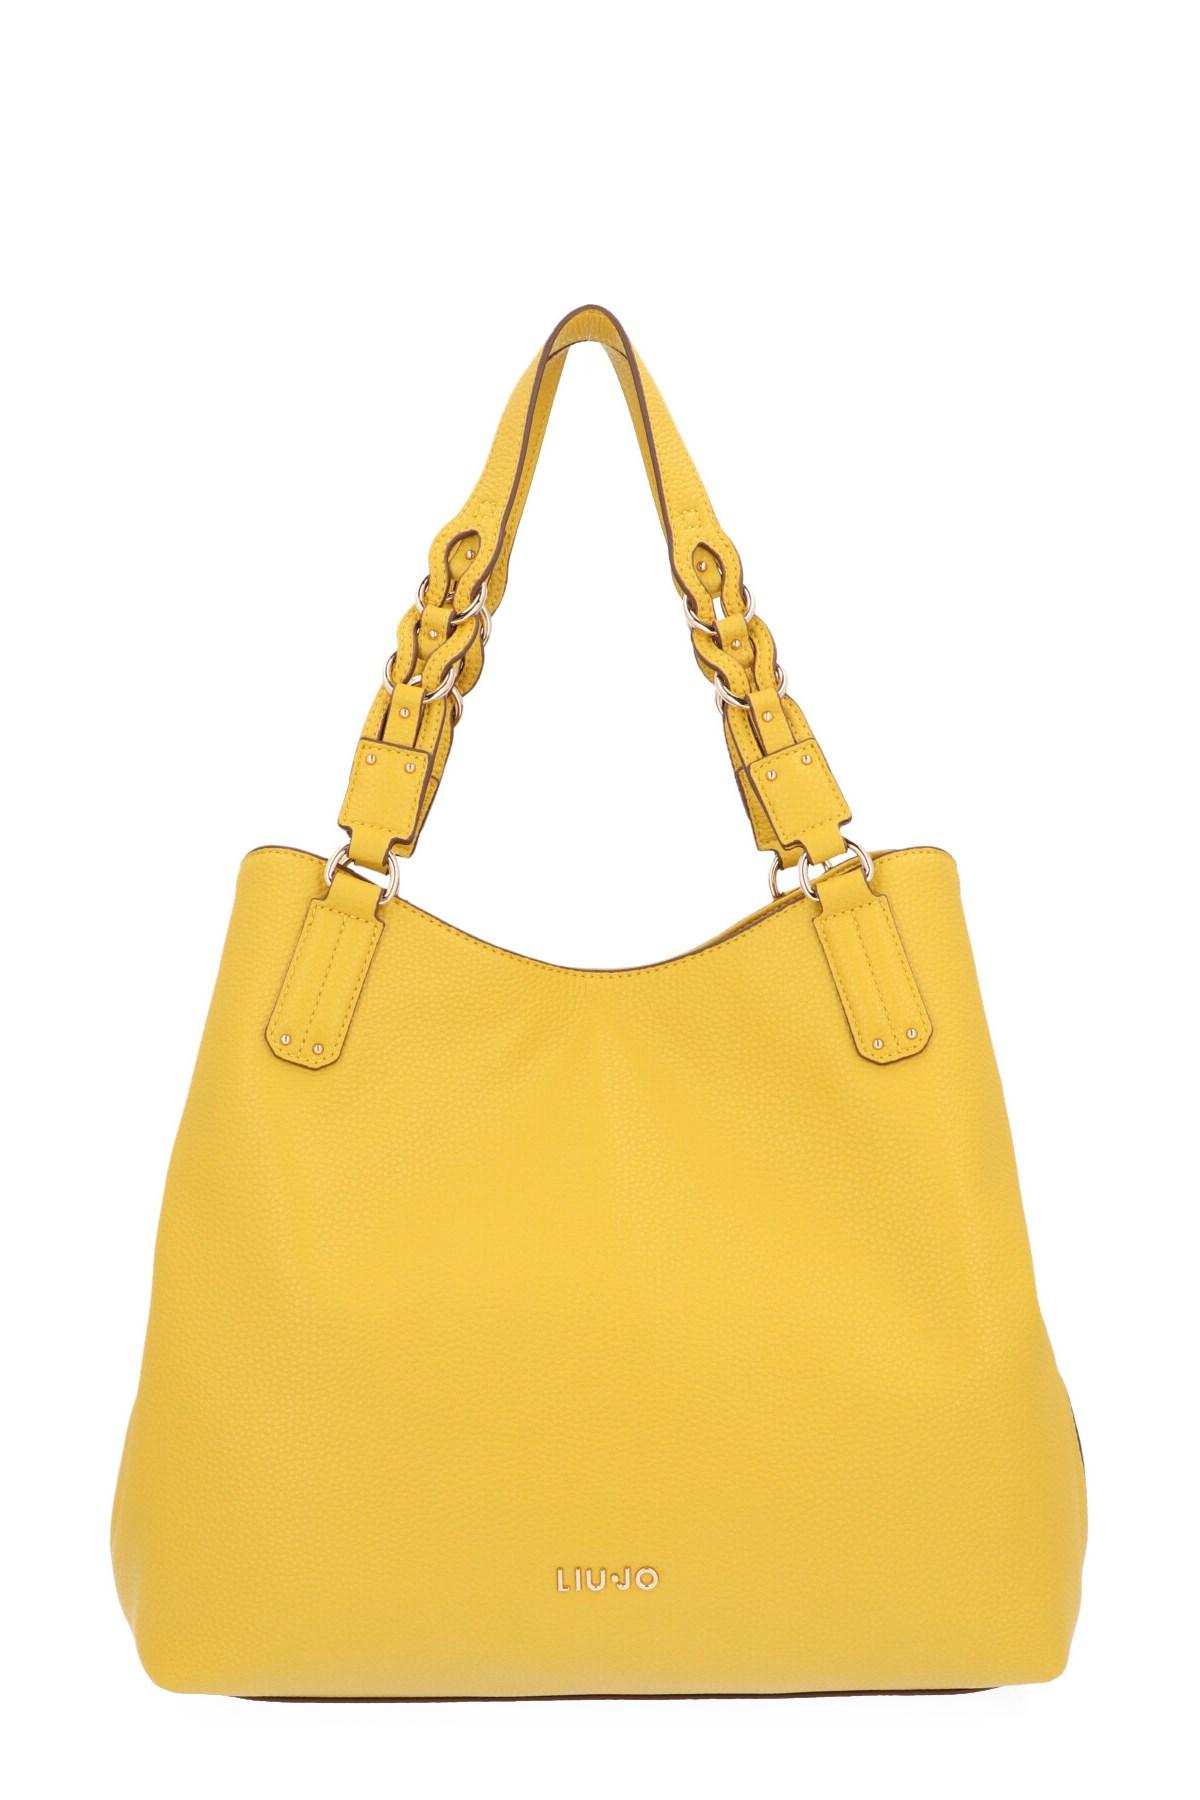 reputable site 56e91 20889 liu jo 'Satchel' shoulder bag available on www.julian ...